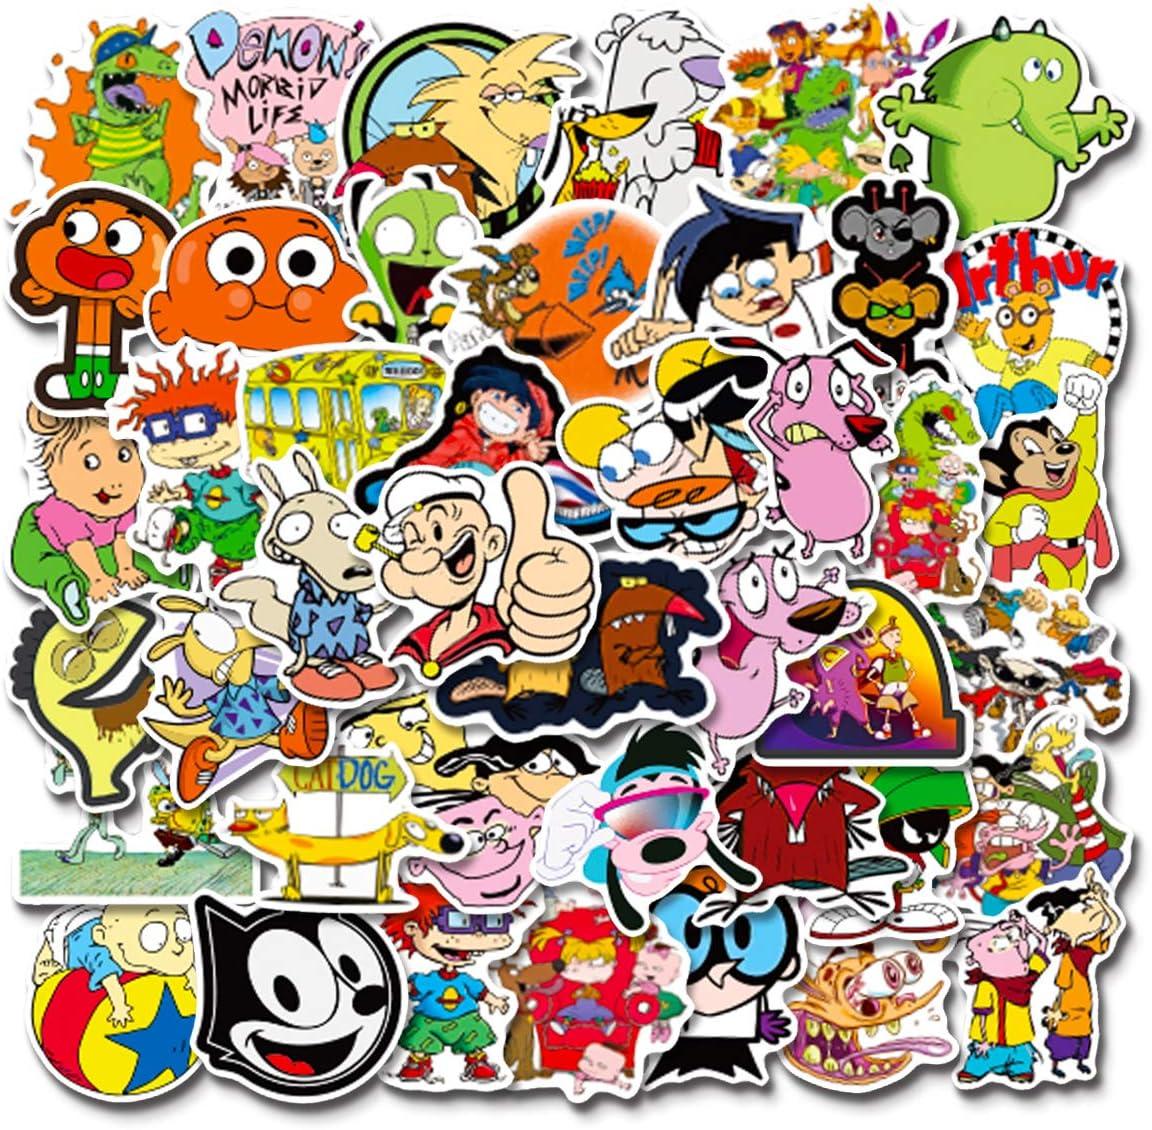 90s Cartoon Stickers  50 PCS   Vinyl Waterproof Stickers for Laptop,Bumper,Skateboard,Water Bottles,Computer,Phone, Anime Stickers for Adult Teens Kids(90s Cartoon) (90s Cartoon Sticker)